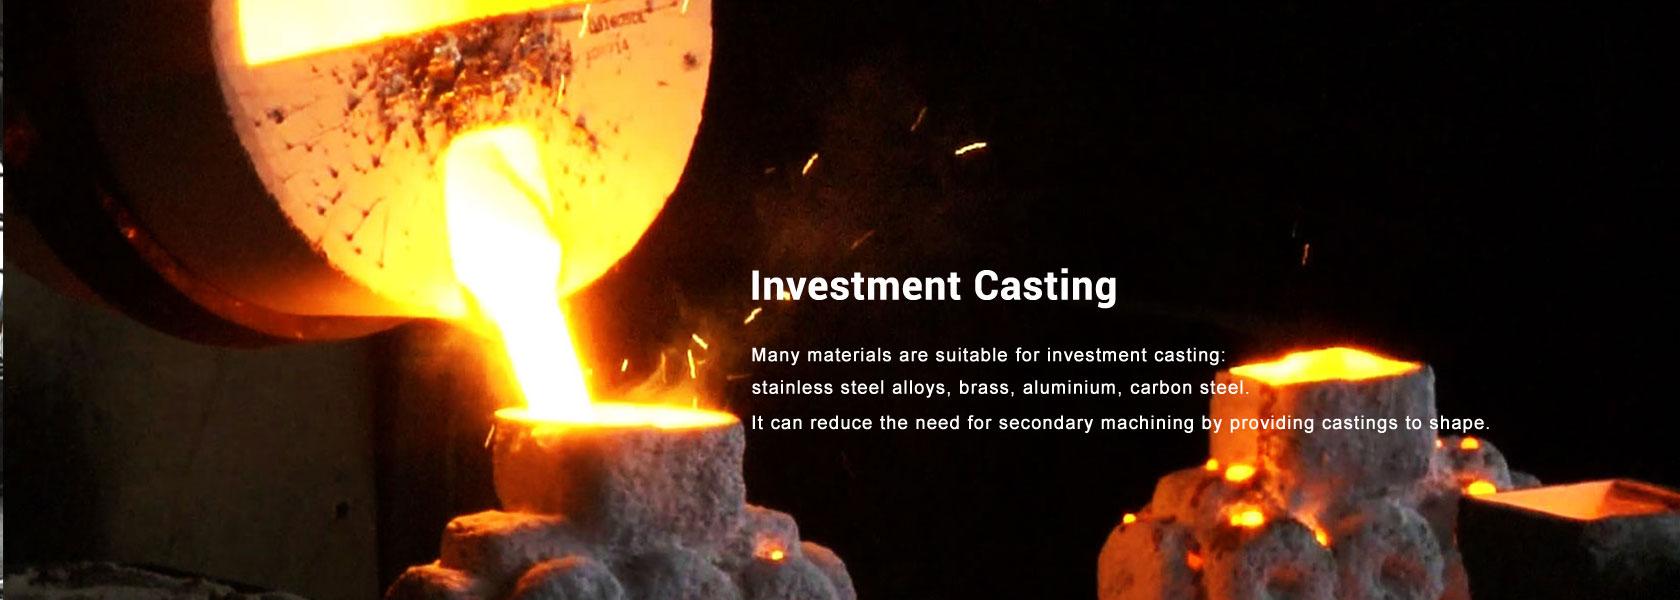 Investment casting, sand casting, gravity casting,die casting